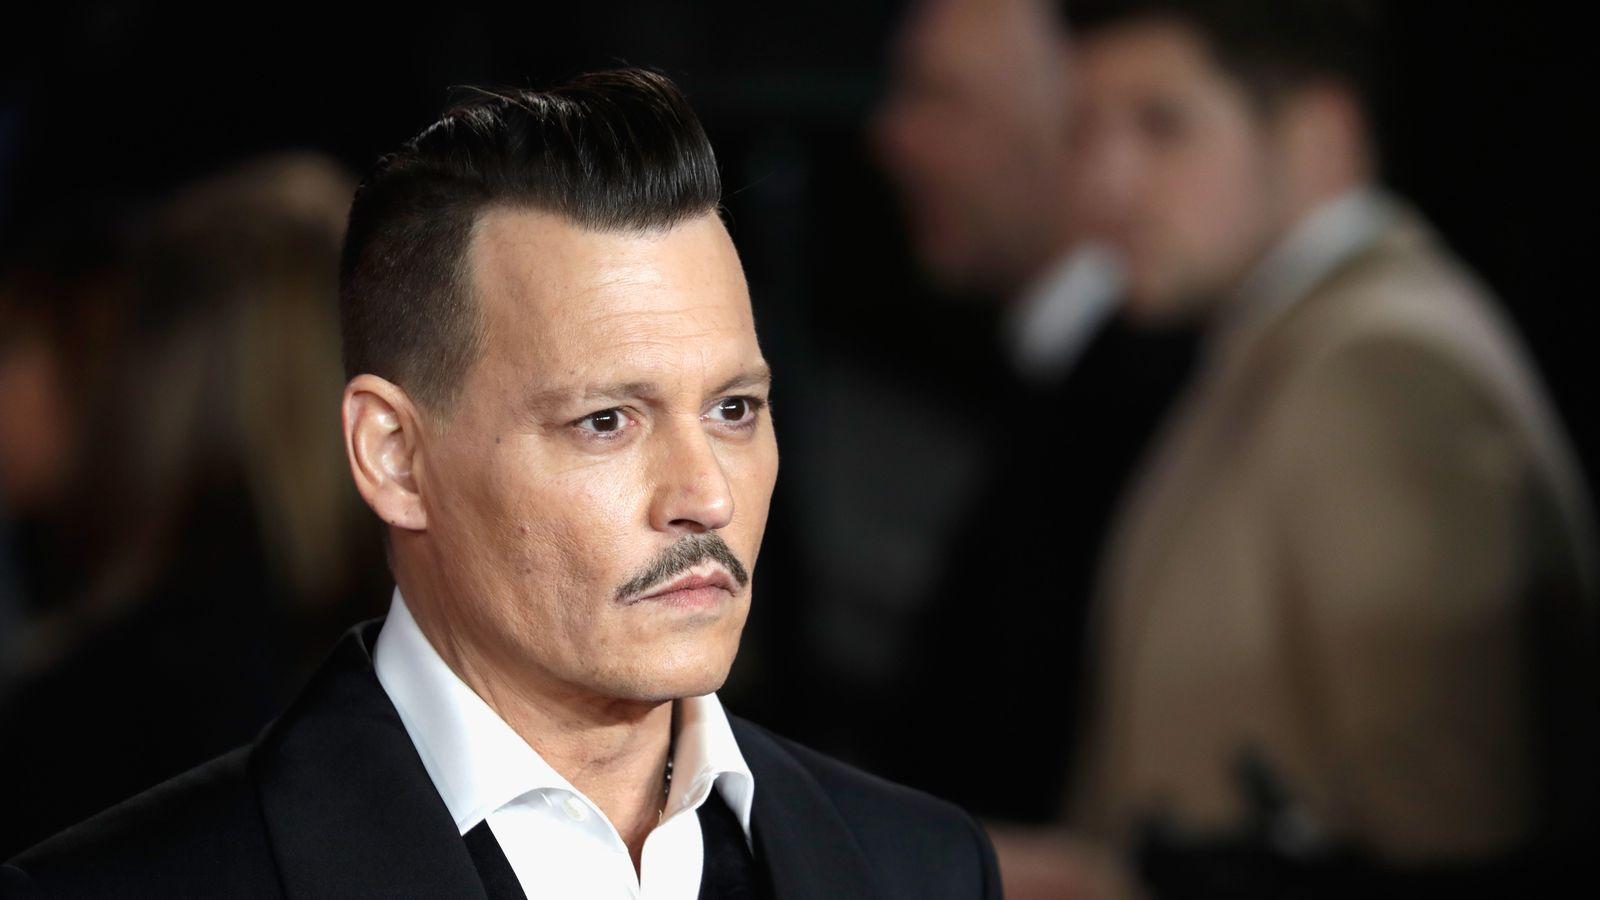 'In pain' Johnny Depp wrote memoir over Heard split and financial woes